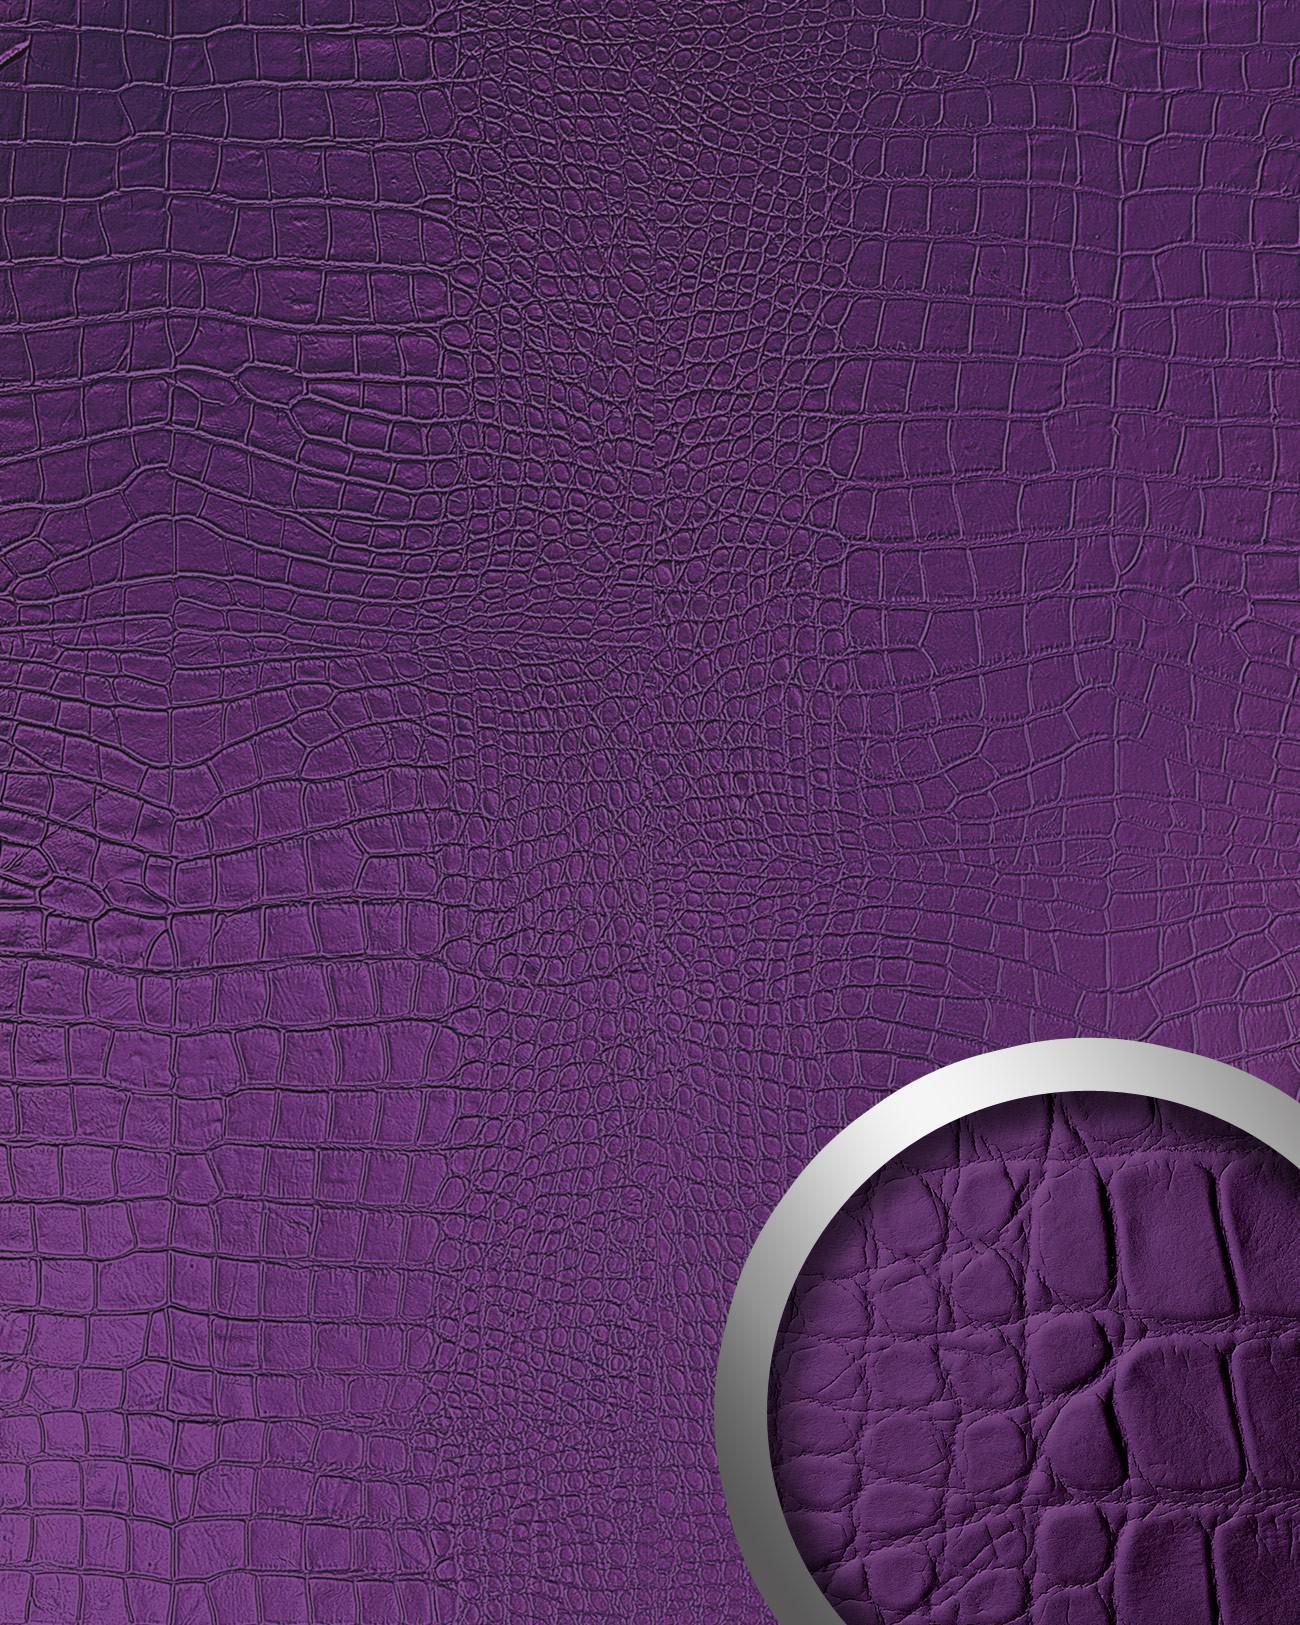 wandpaneel 3d luxus leder blickfang wallface 16415 croco nova dekor verkleidung selbstklebende. Black Bedroom Furniture Sets. Home Design Ideas